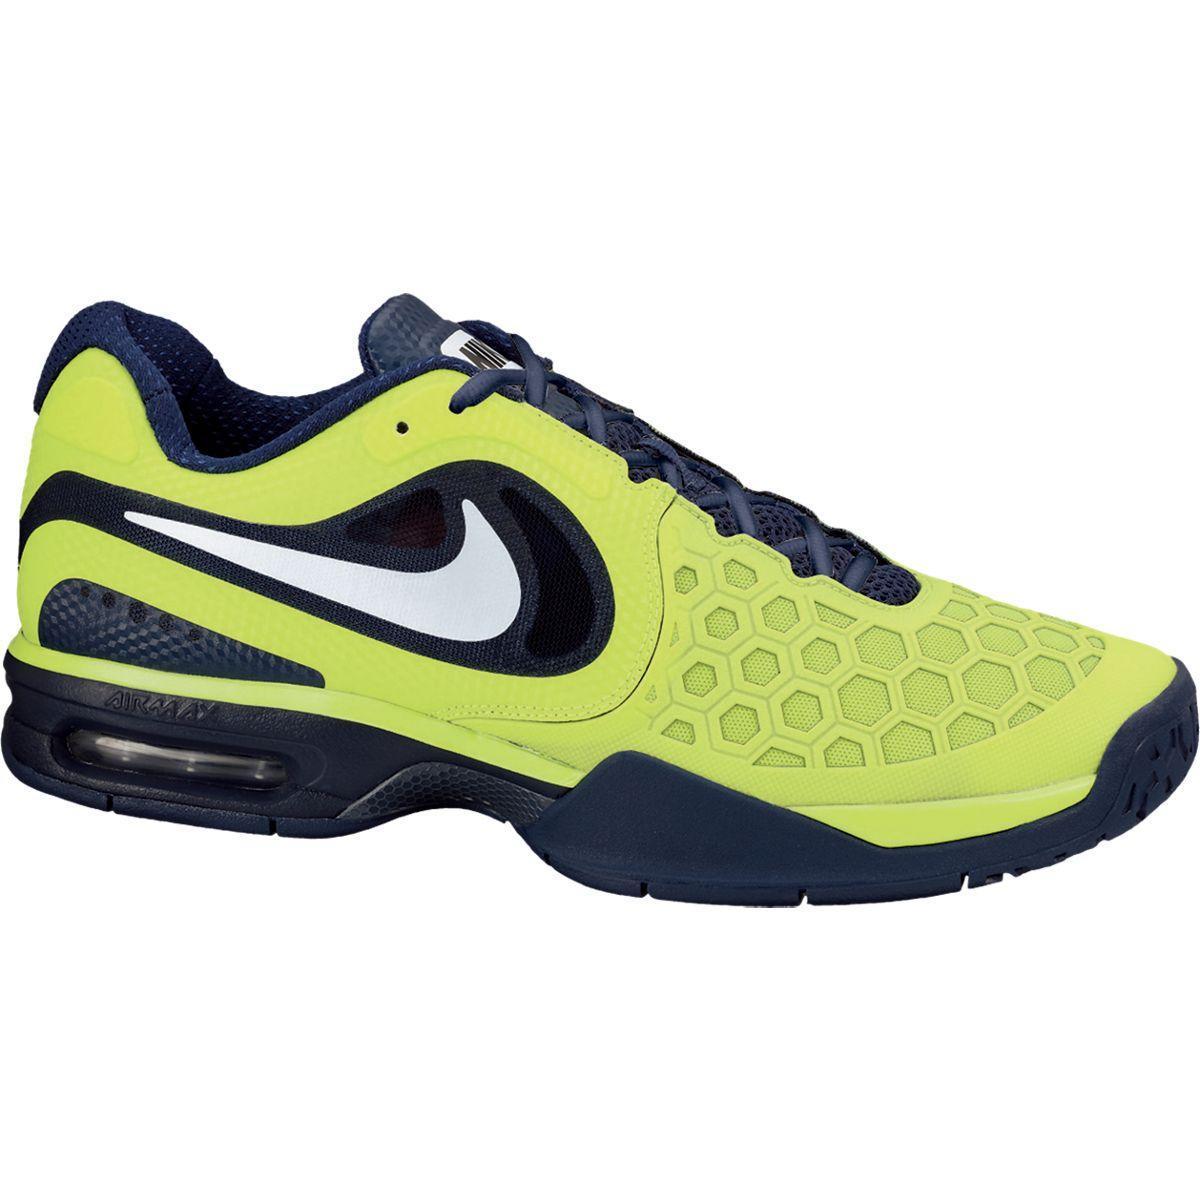 big sale d1ff1 4b2f6 Nike Mens Air Max CourtBallistec 4.3 Tennis Shoes - Lime Navy -  Tennisnuts.com